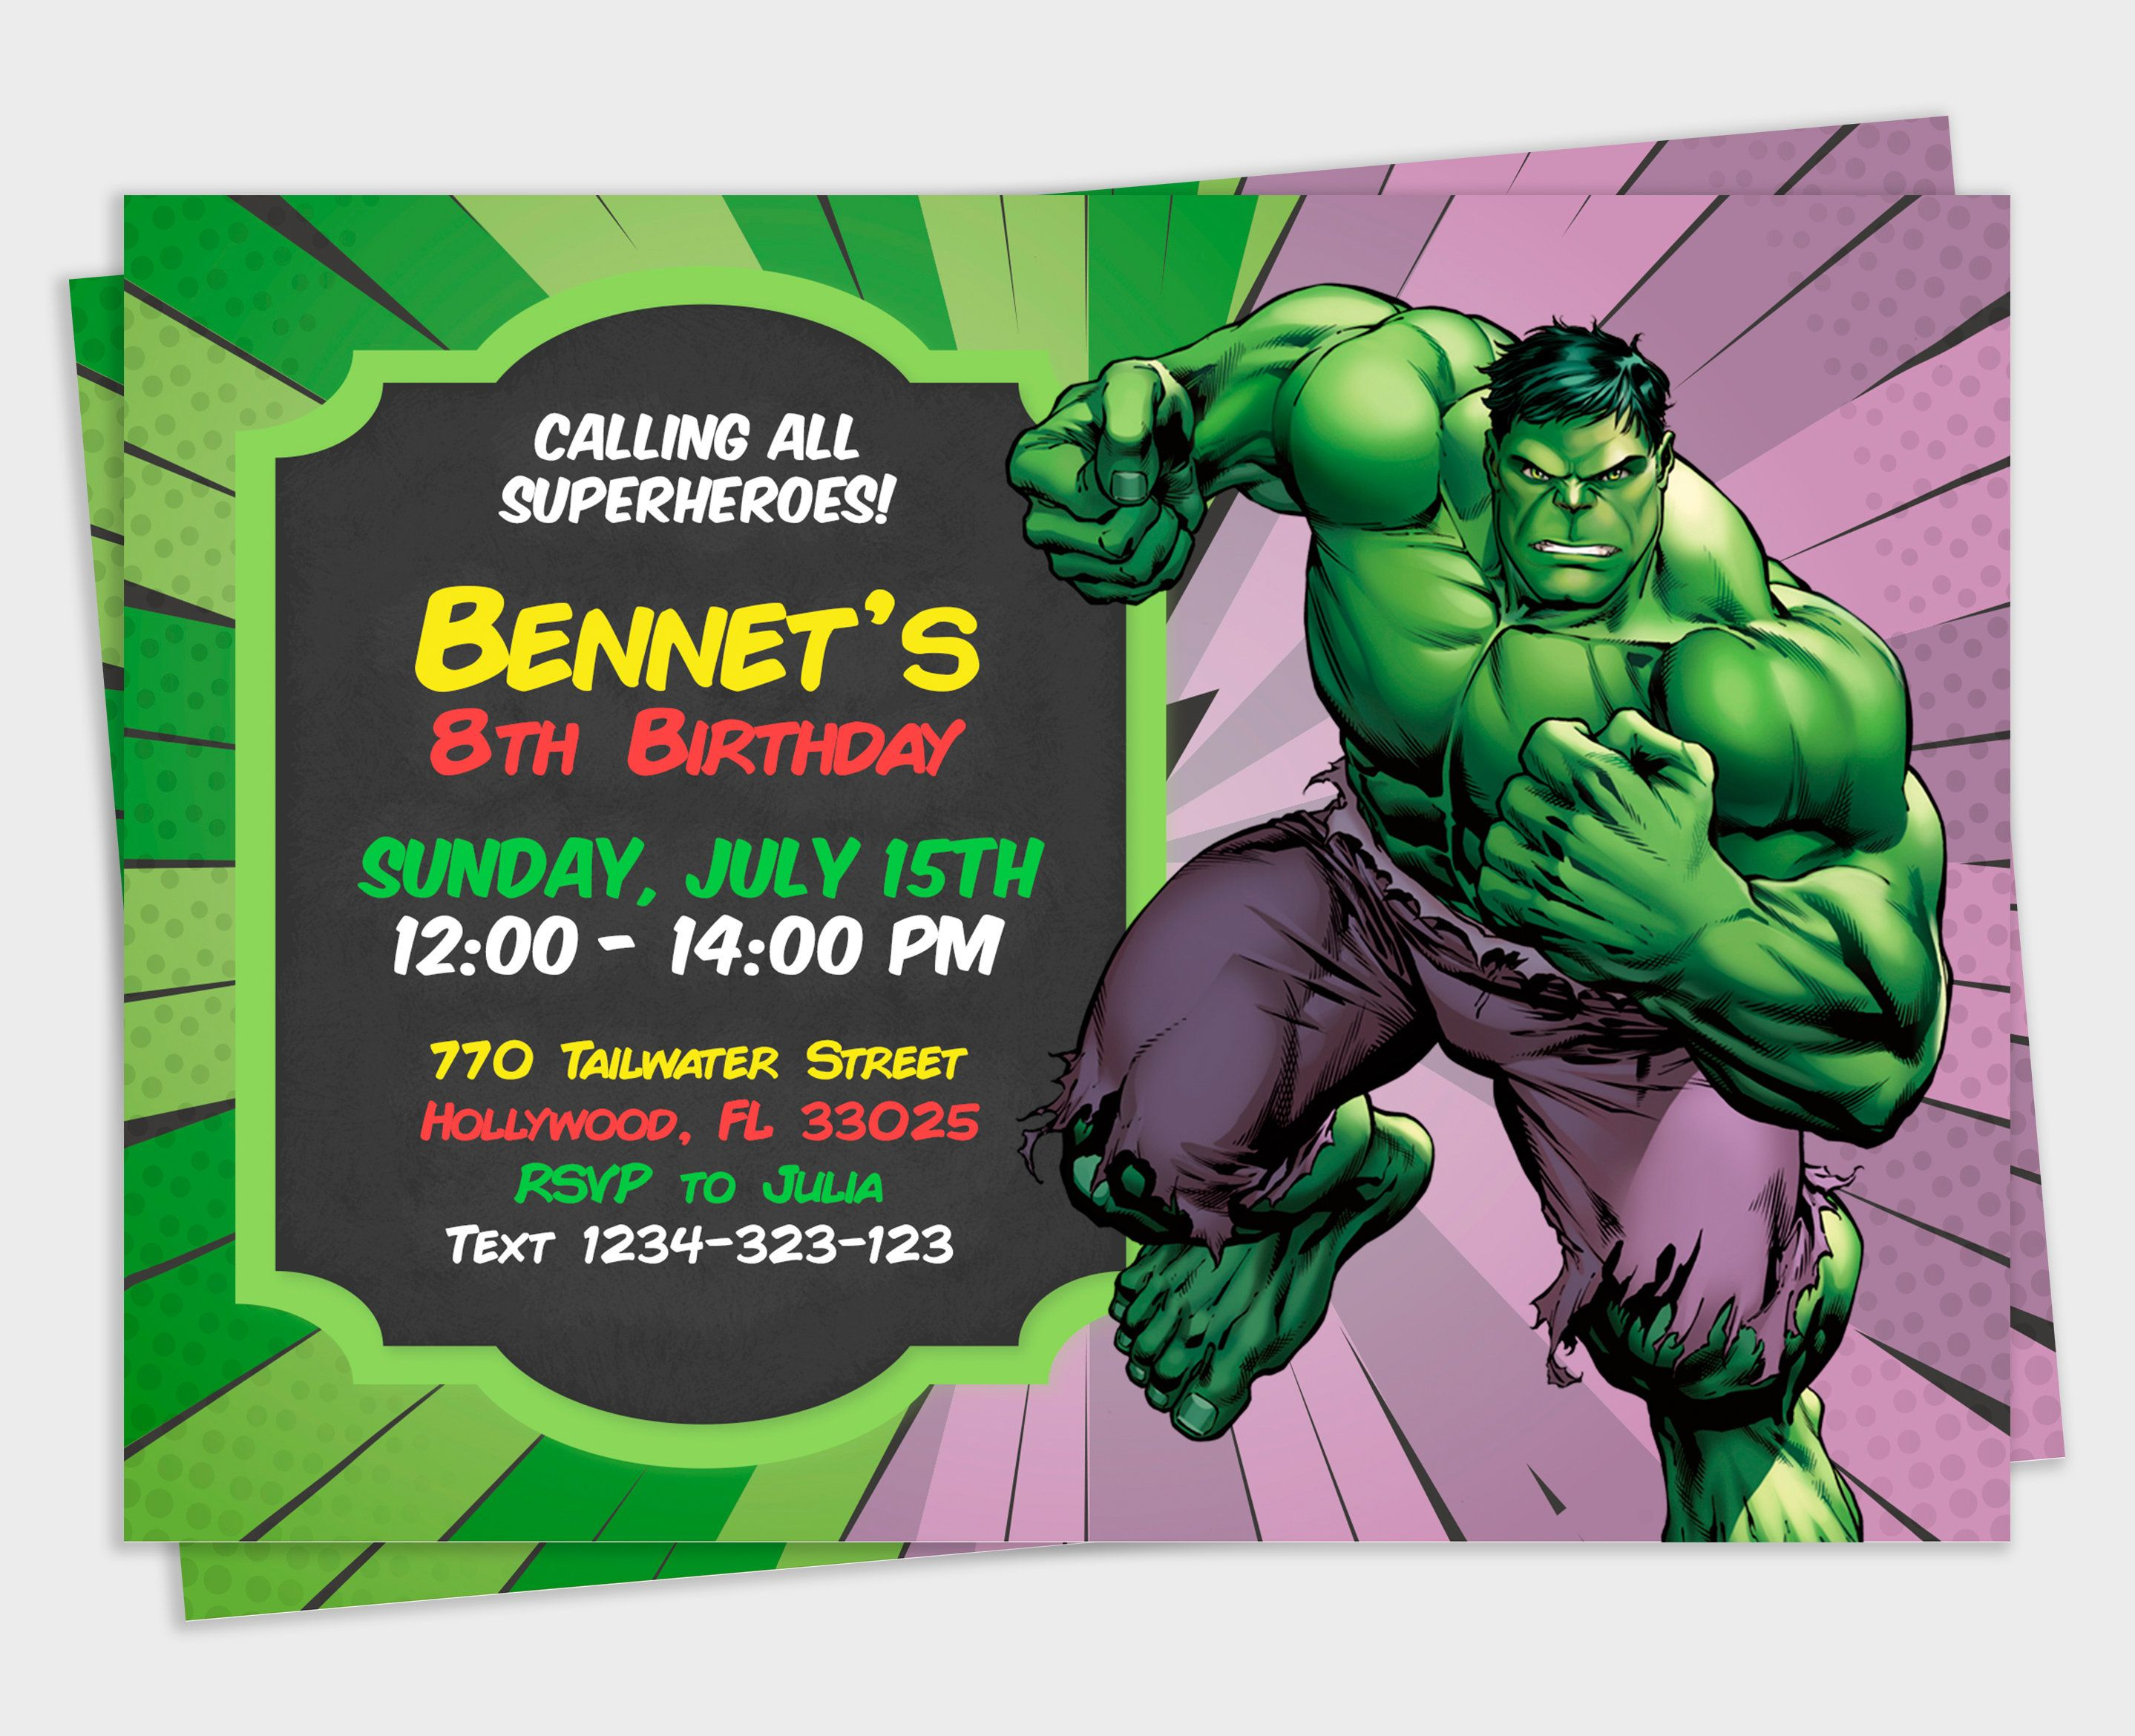 Hulk Invitation Hulk Party Hulk Birthday Birthday Invitation Avengers Invitation Invitation For Kids Print Hulk Birthday Hulk Party Hulk Birthday Parties